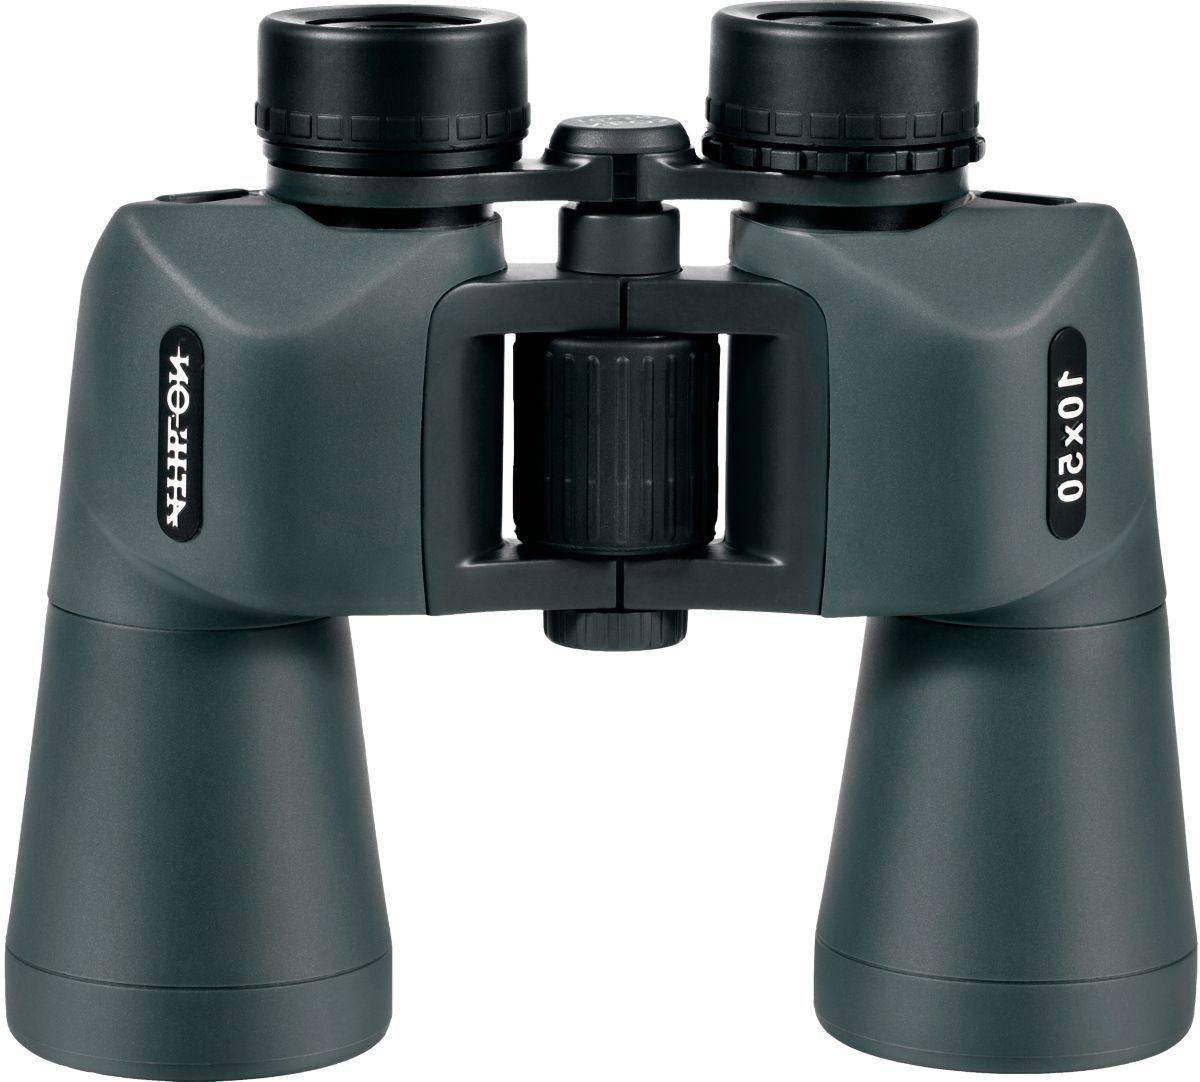 Athlon Neos Porro-Prism Binoculars